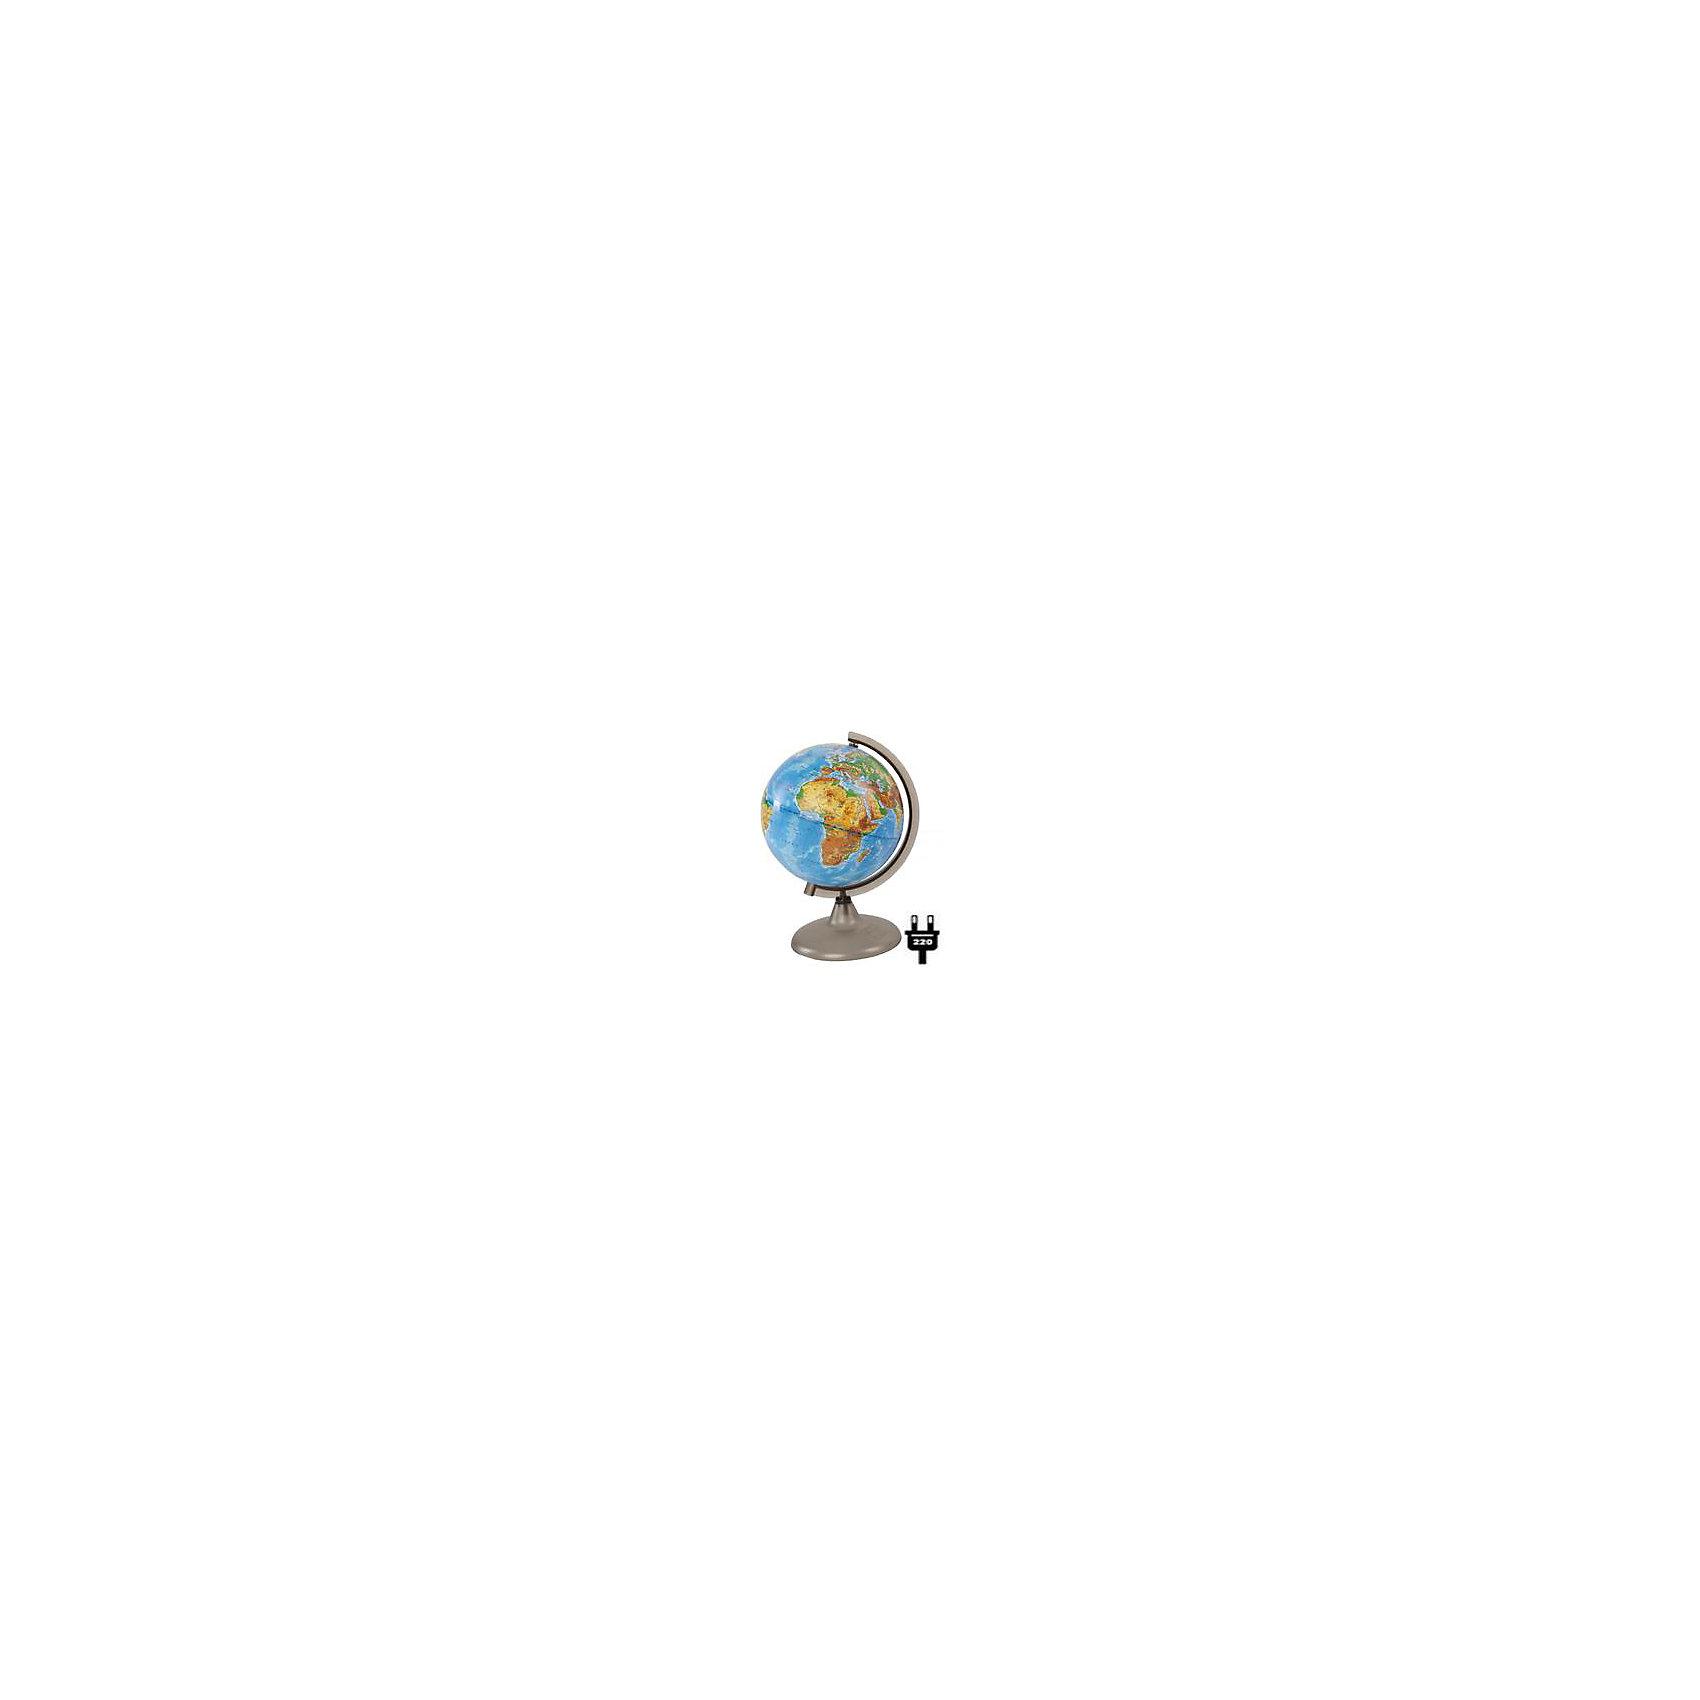 Глобус Земли физический с подсветкой, диаметр 210 ммДиаметр: 210 мм<br><br>Масштаб: 1:60000000<br><br>Материал подставки: дерево<br><br>Цвет подставки: Вишня, Орех<br><br>Ширина мм: 217<br>Глубина мм: 217<br>Высота мм: 315<br>Вес г: 180<br>Возраст от месяцев: 72<br>Возраст до месяцев: 2147483647<br>Пол: Унисекс<br>Возраст: Детский<br>SKU: 5518201